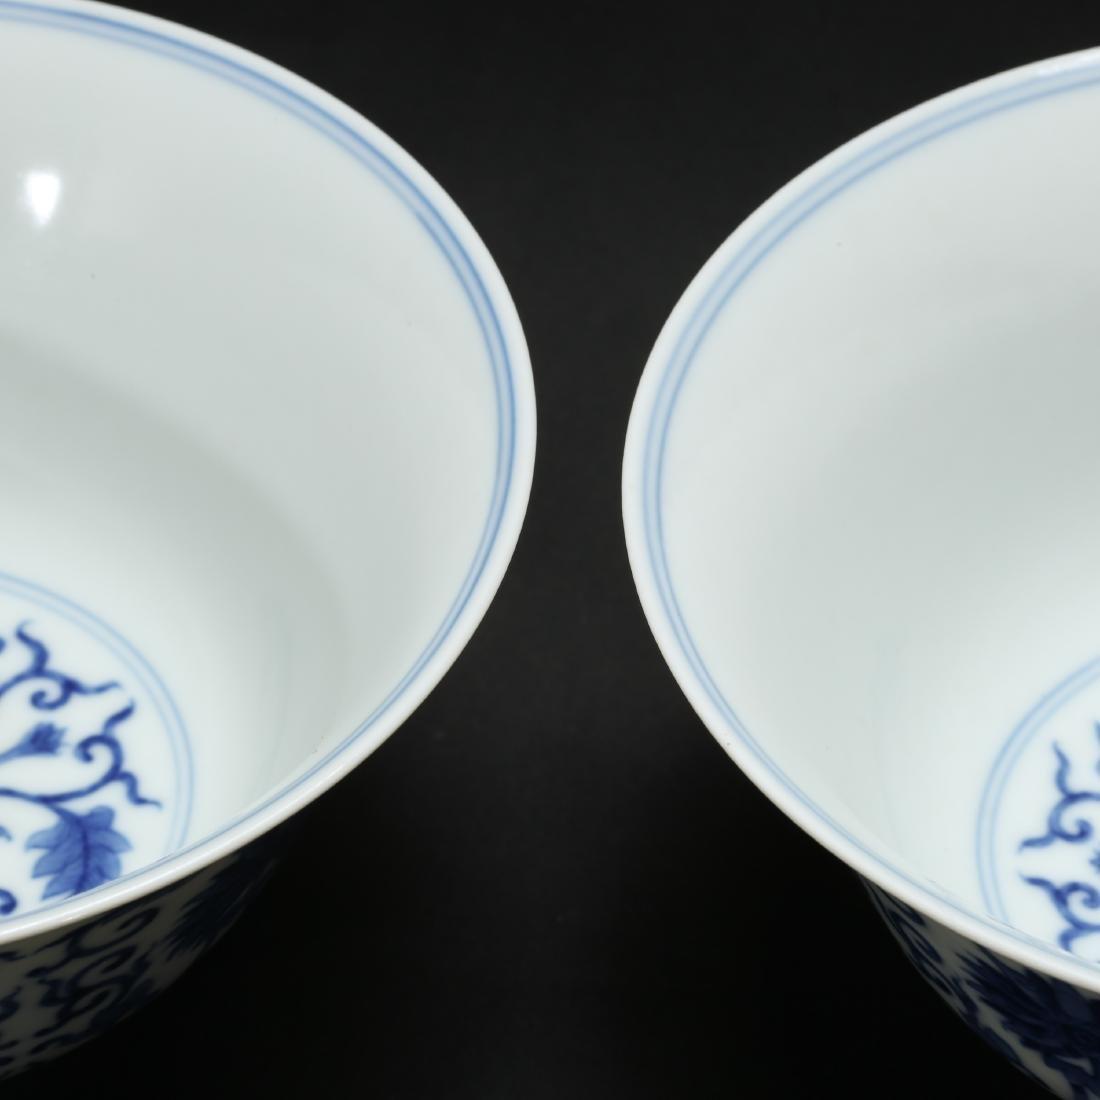 CHINESE BLUE AND WHITE FOLIAGE BOWLS - 8